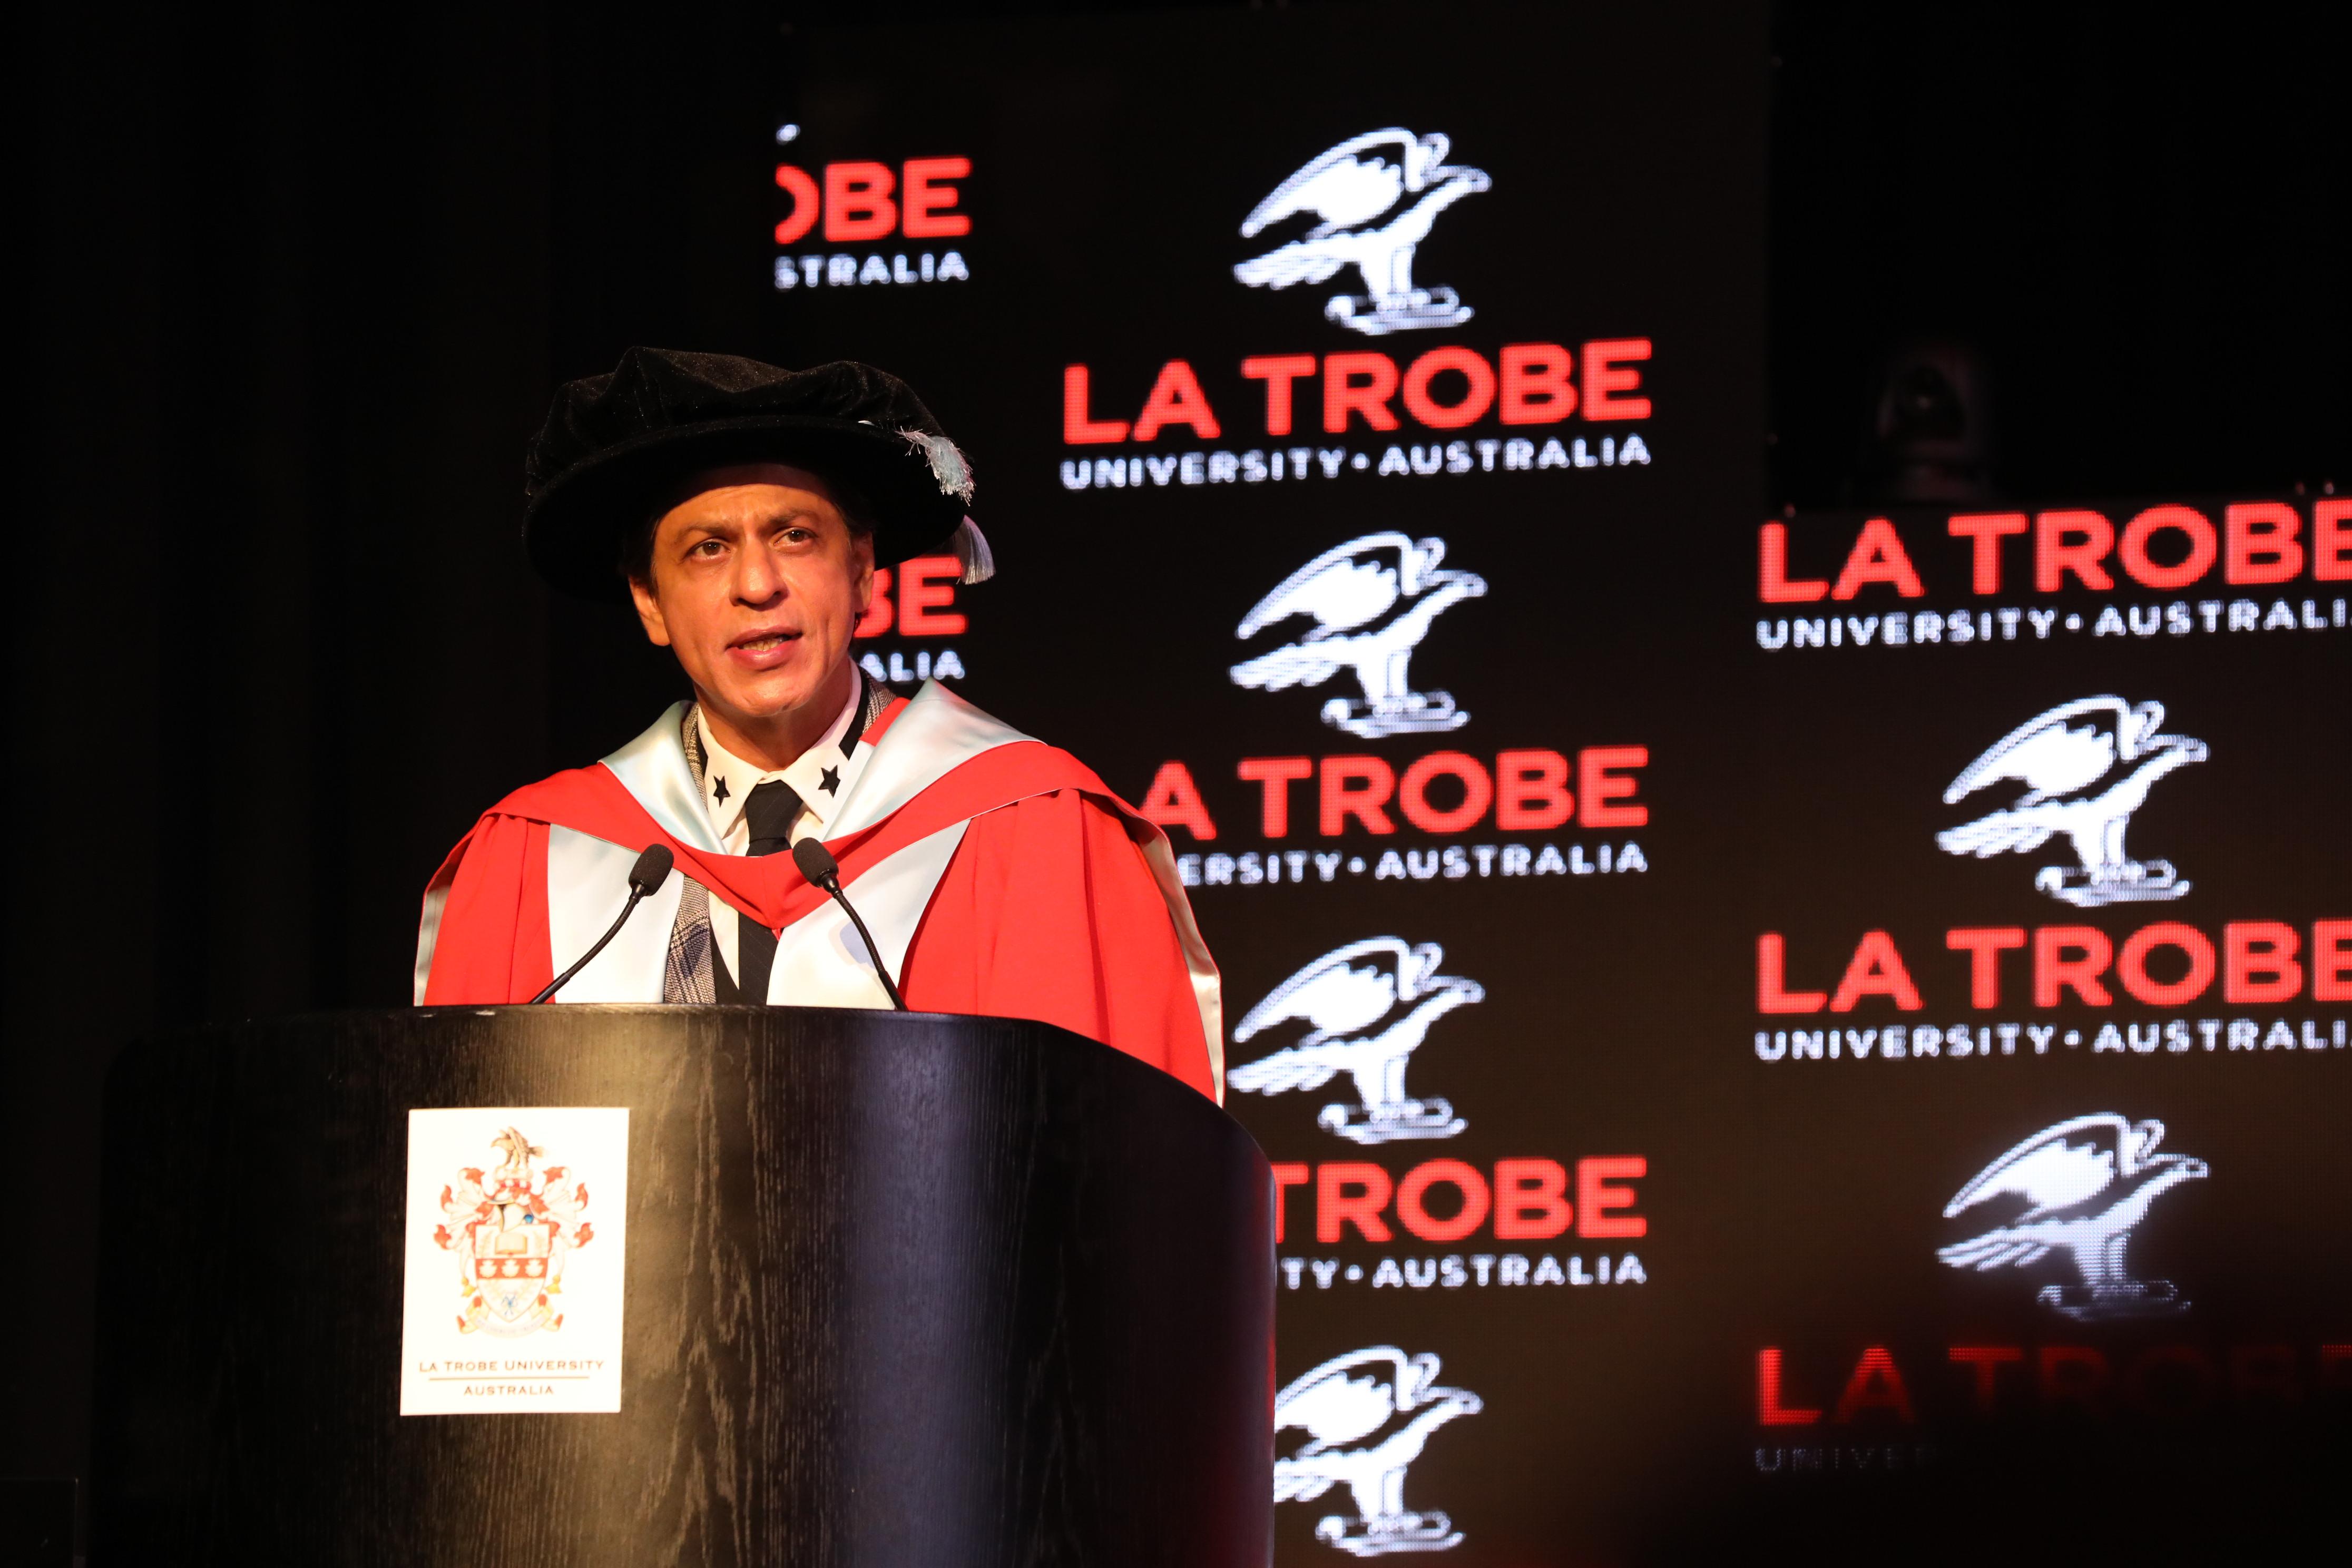 Shah Rukh Khan Scholarship at La Trobe University, Australia